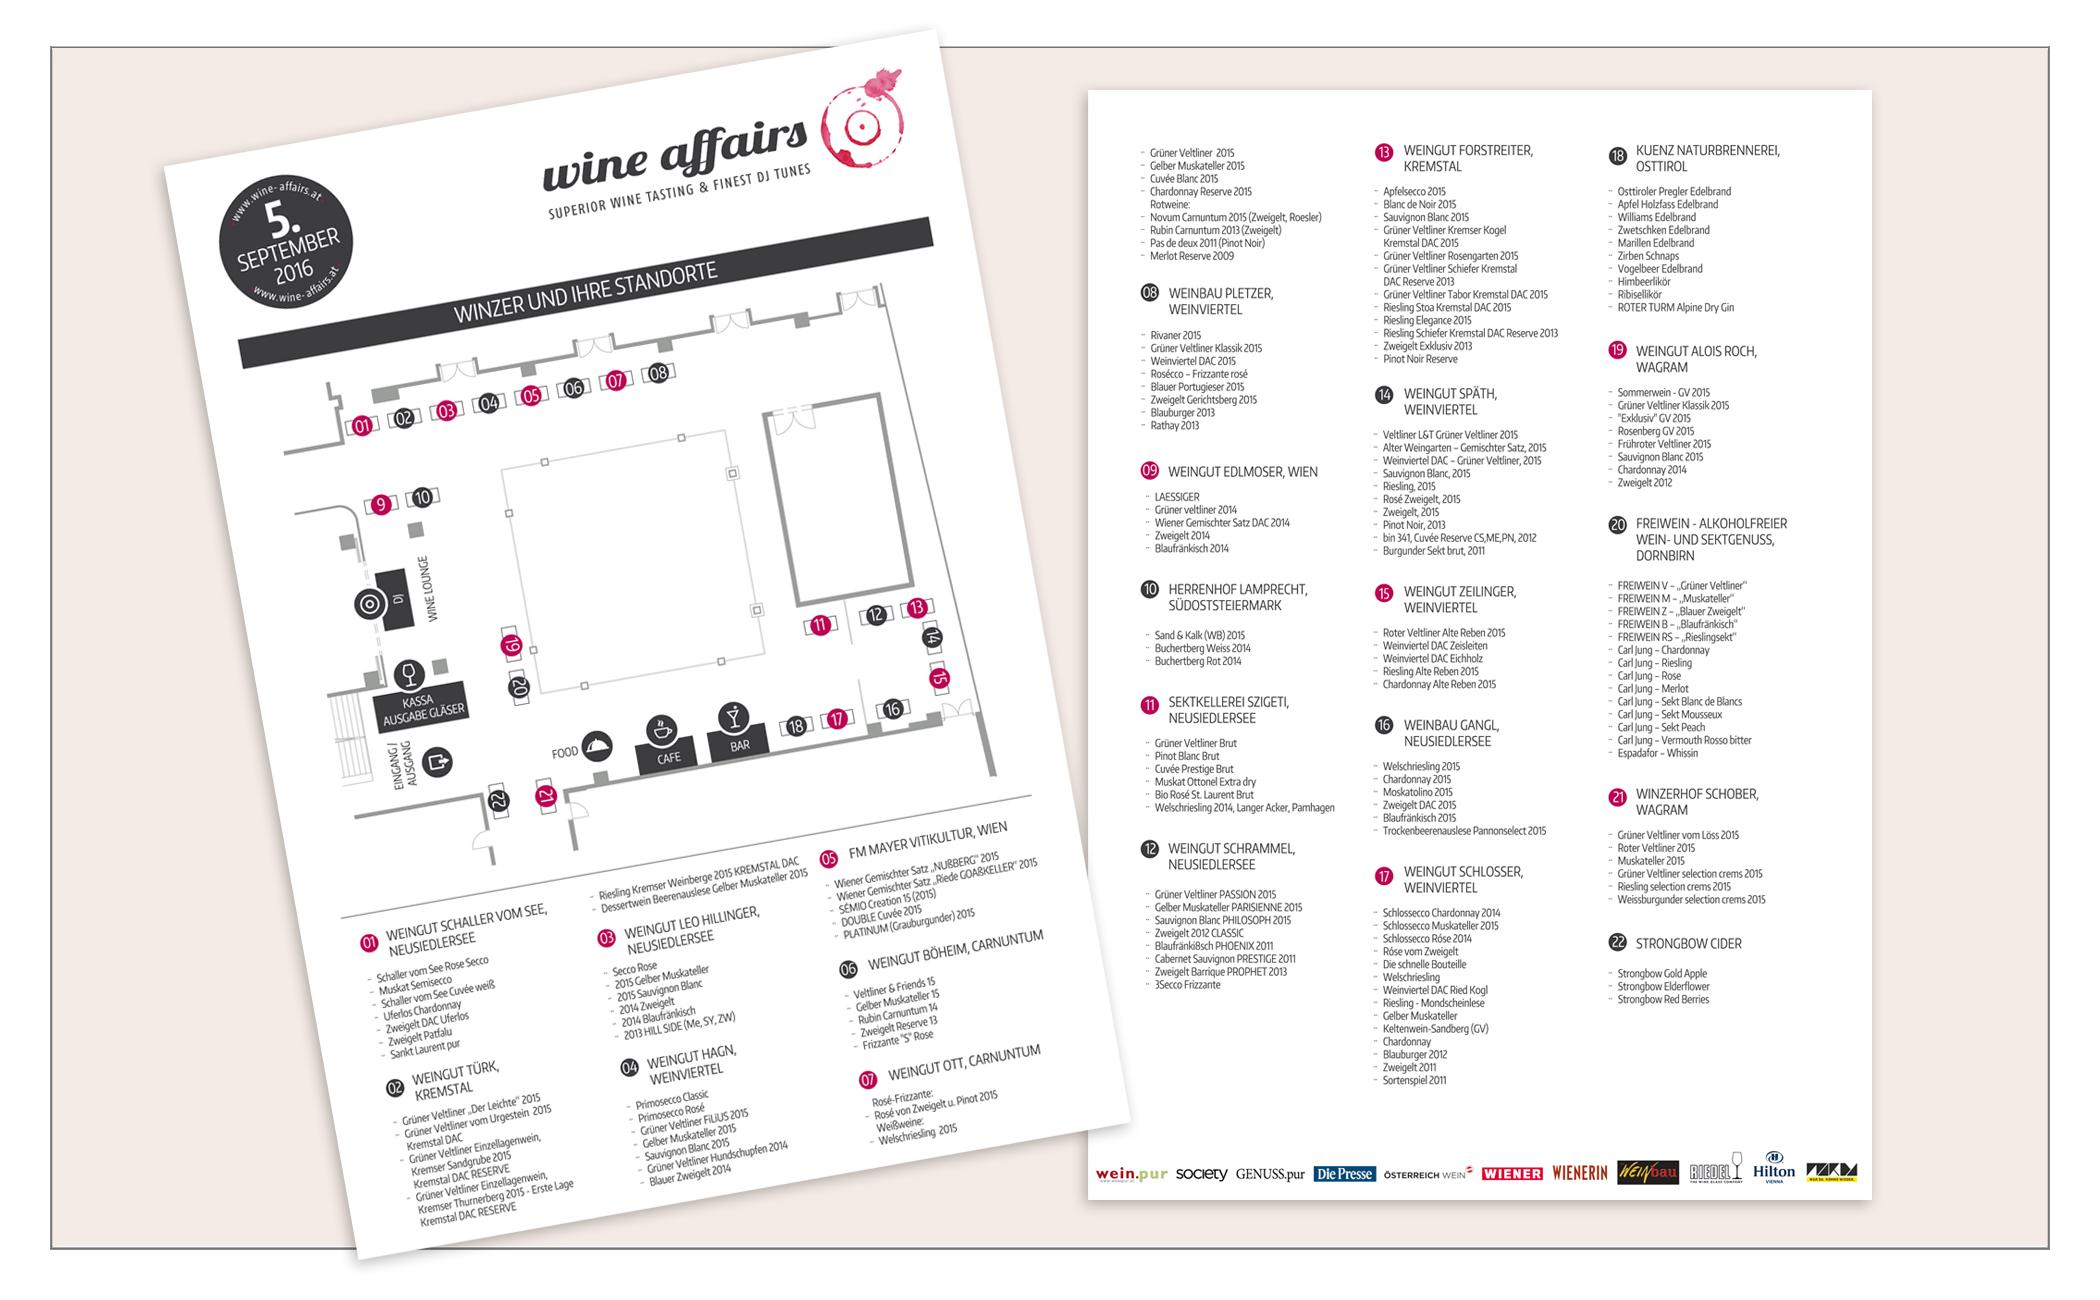 wine affairs Plan